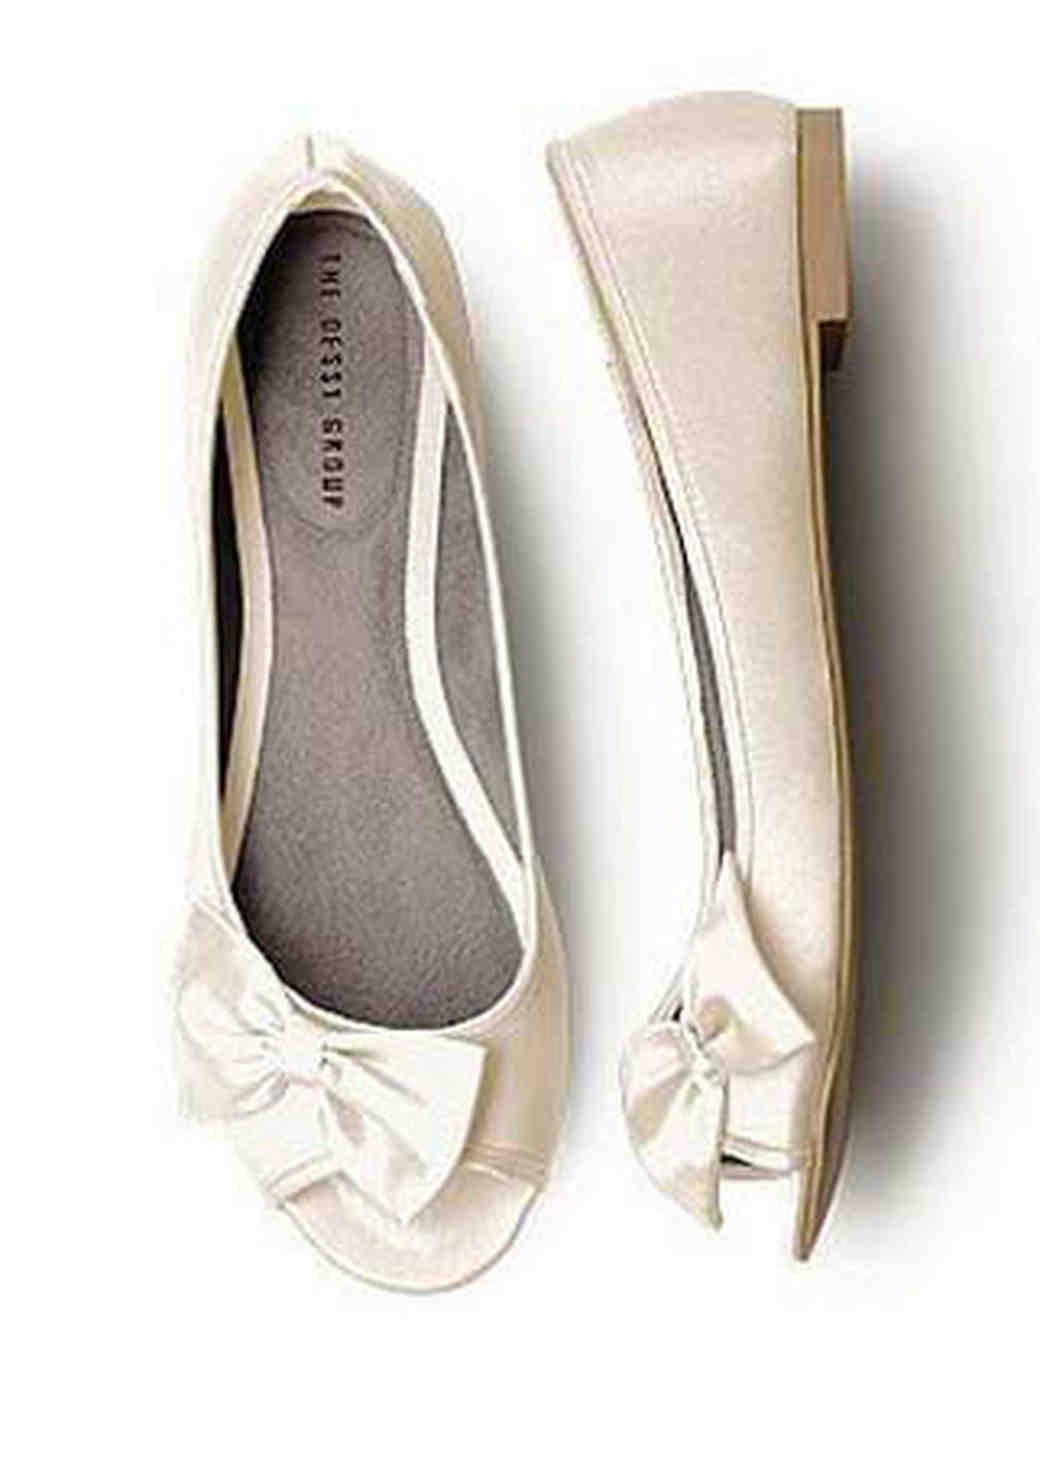 satin-peep-toe-flats-bridal-in-ivory-footwear-accessories-the-dessy-group.jpg